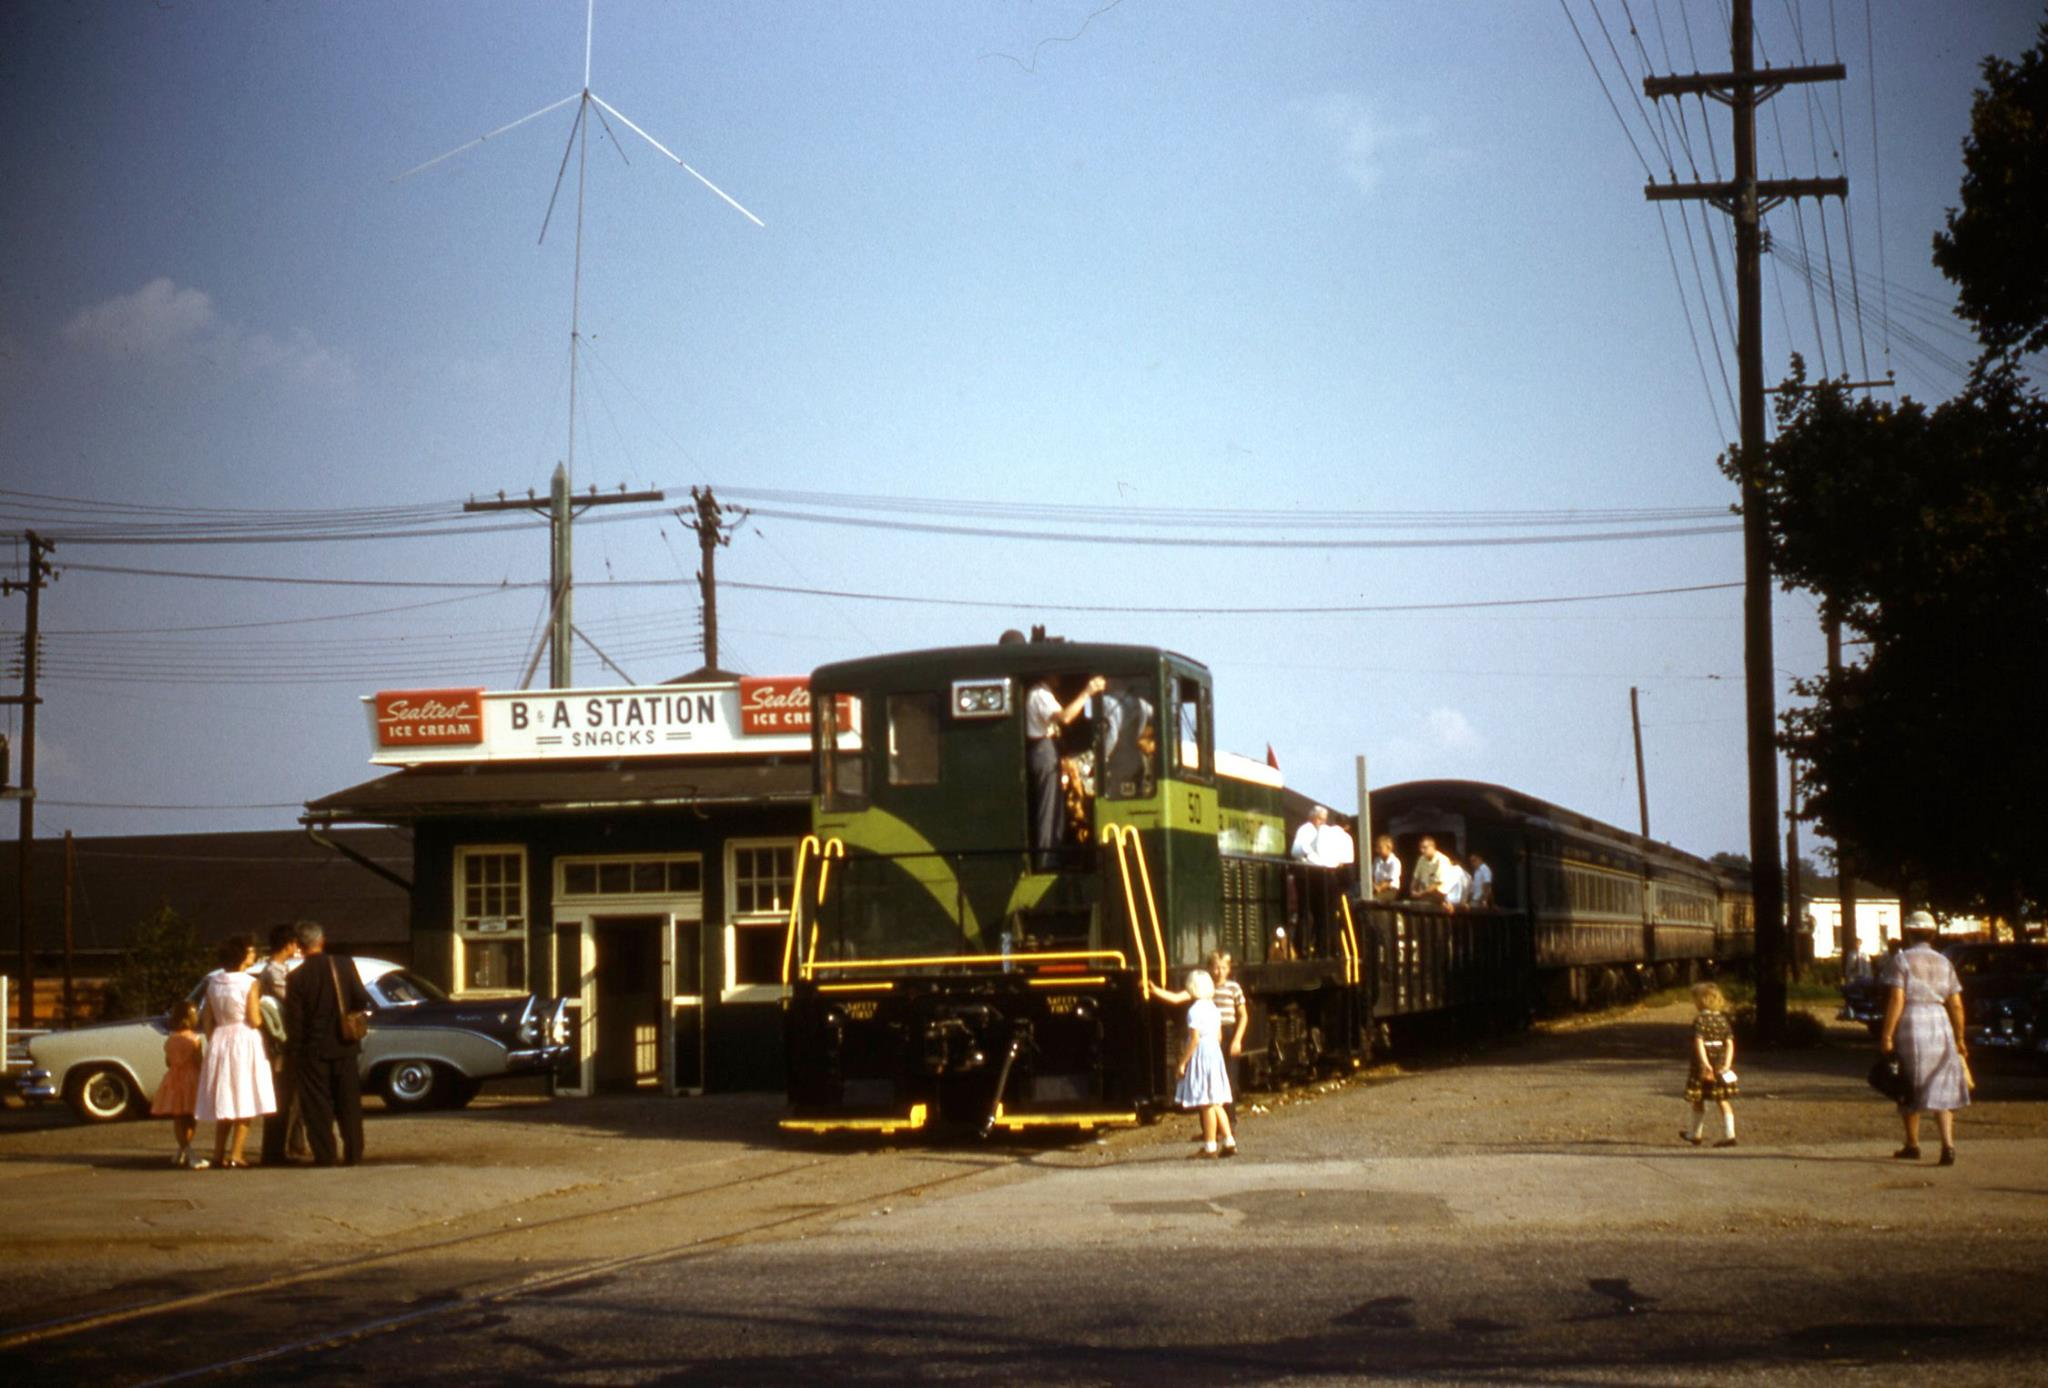 Baltimore & Annapolis Railroad, Glen Burnie Station. Glen Burnie, Maryland Date: September 24, 1961. Source: Robert Riley, Maryland Rail Heritage Library Collection.